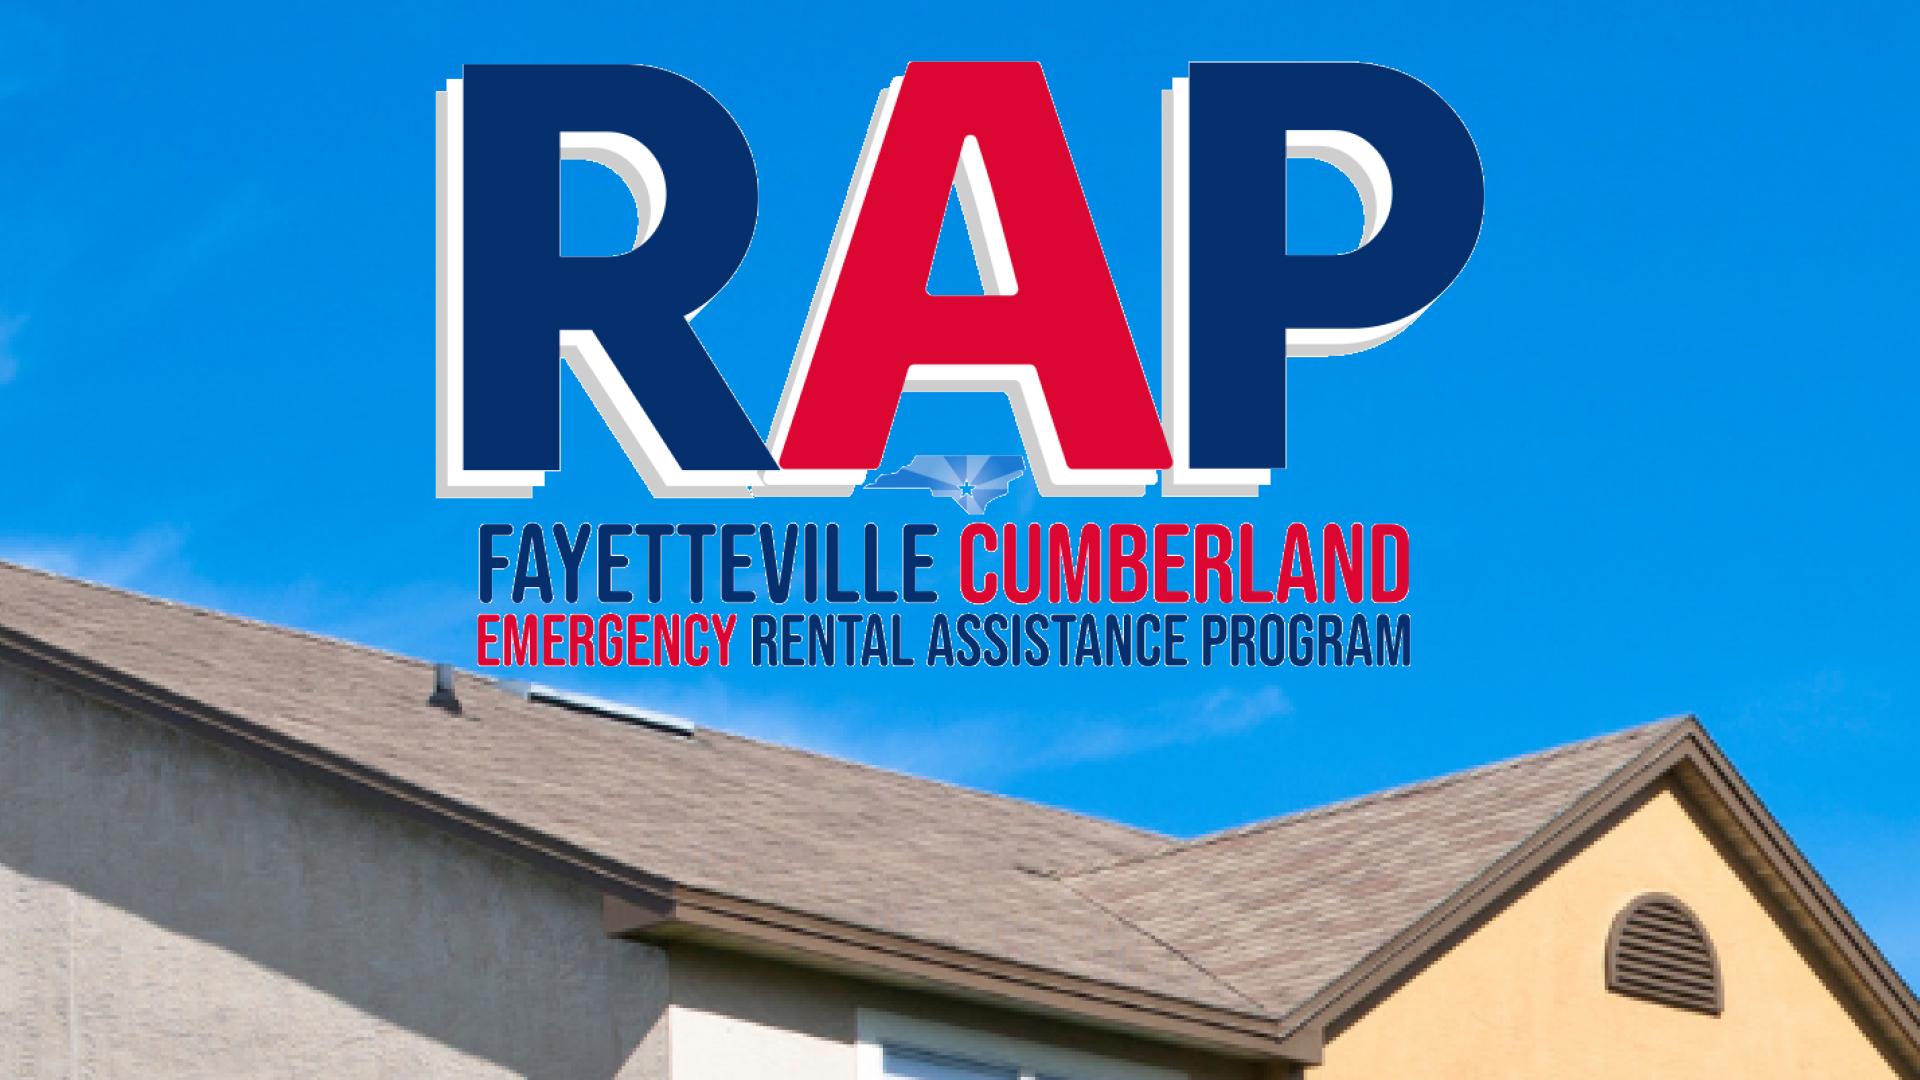 Emergency Rental Assistance Program